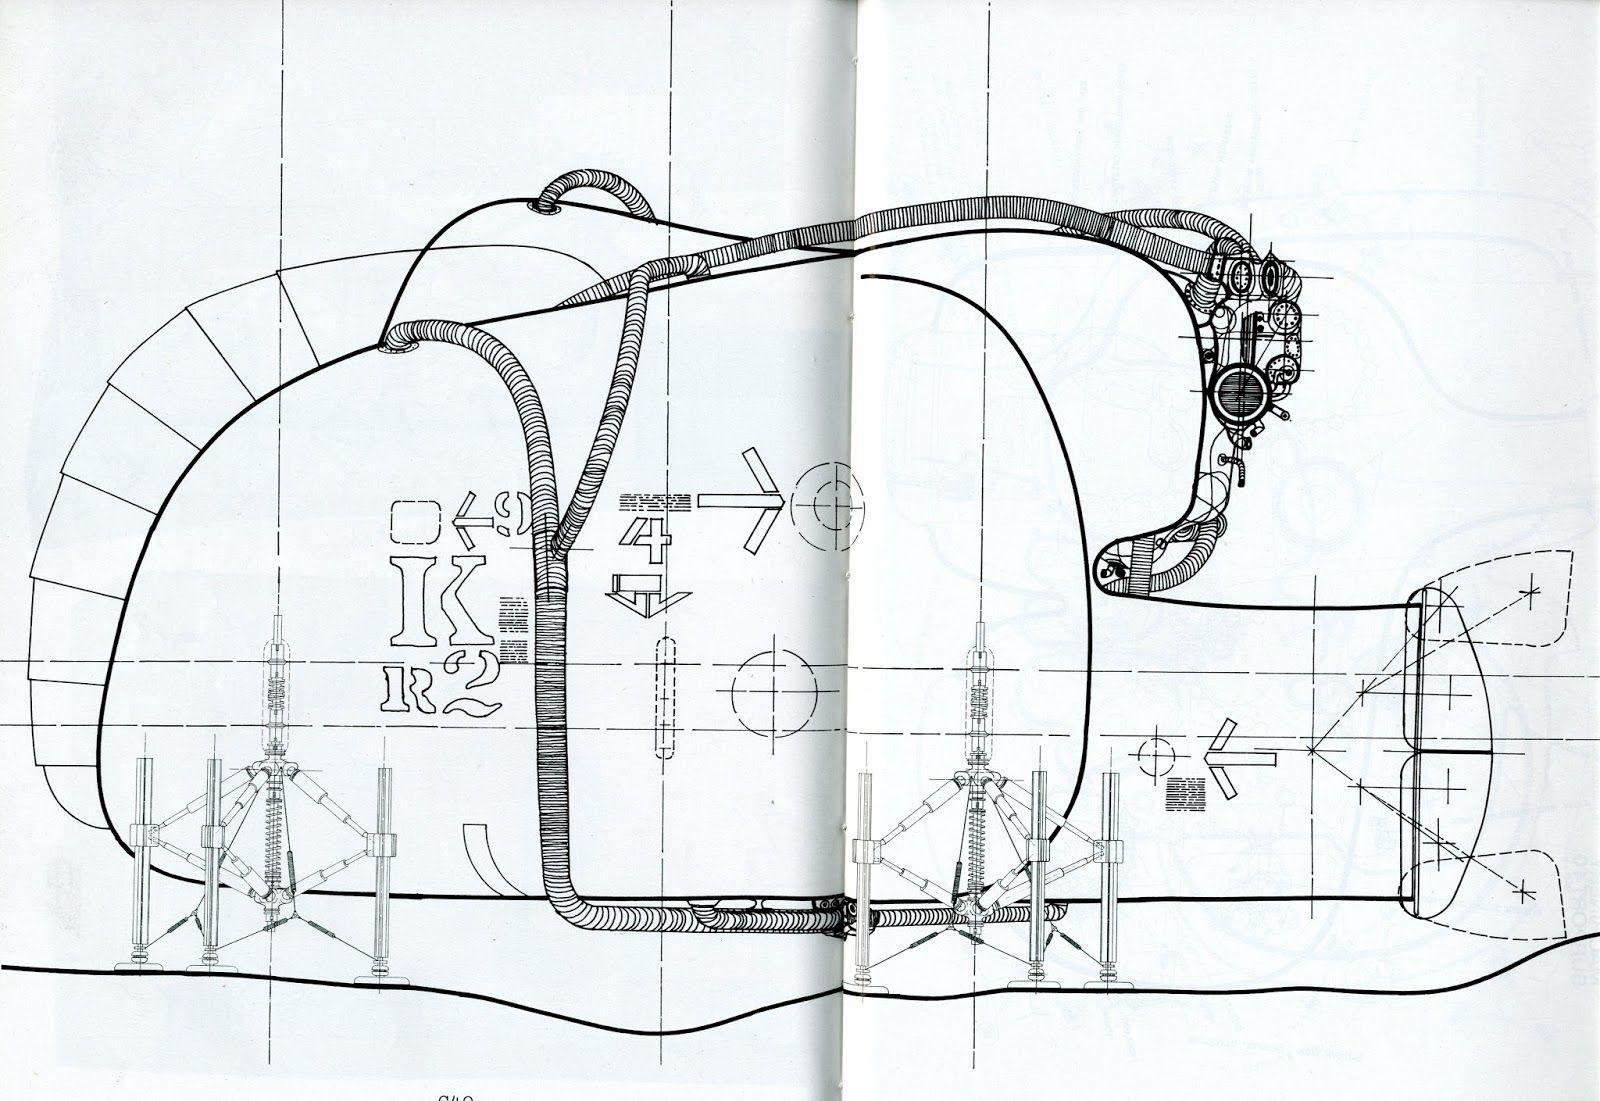 Living Pod Architect David Greene Archigram